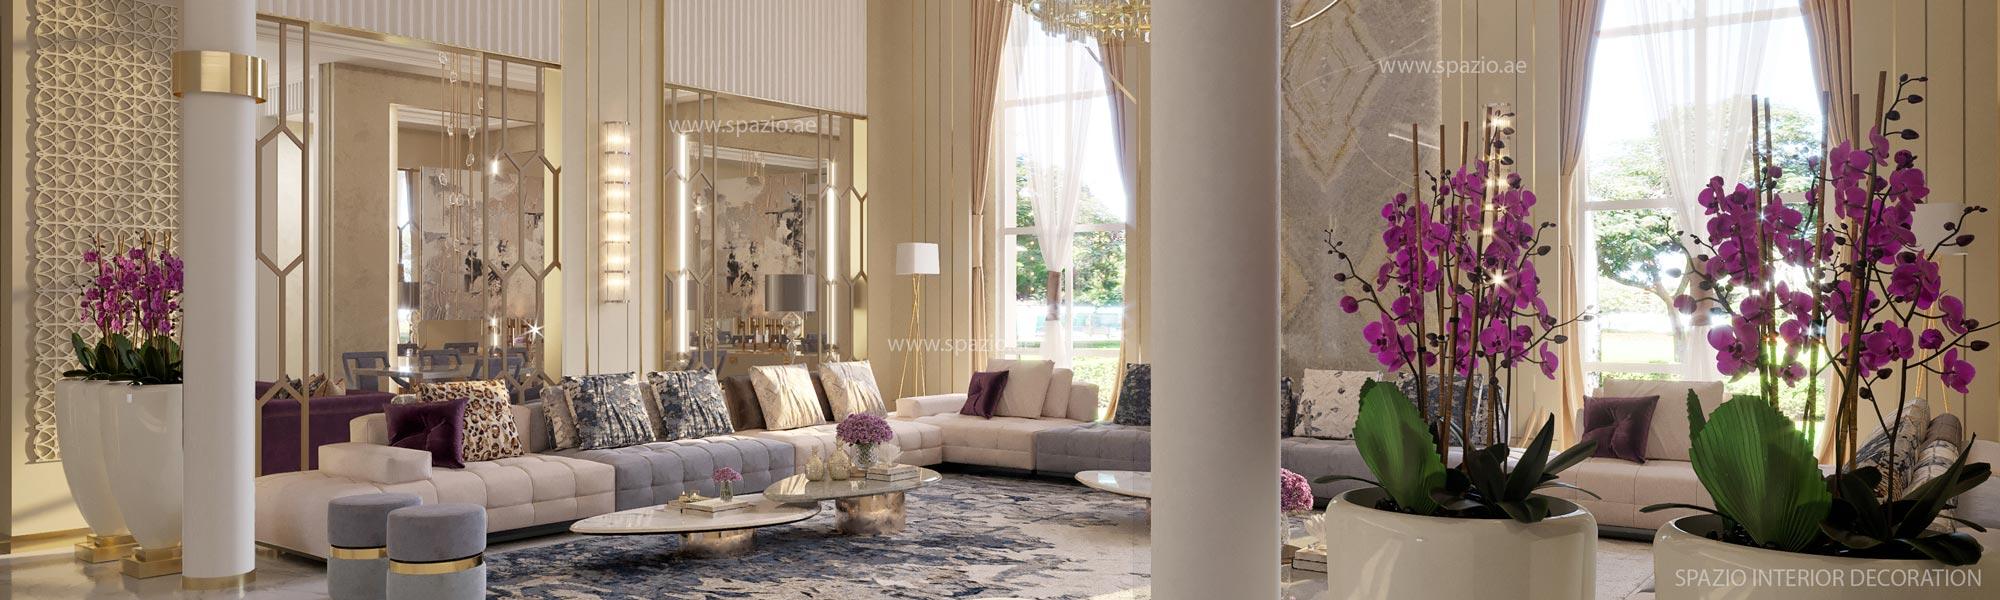 Beautiful luxury living room